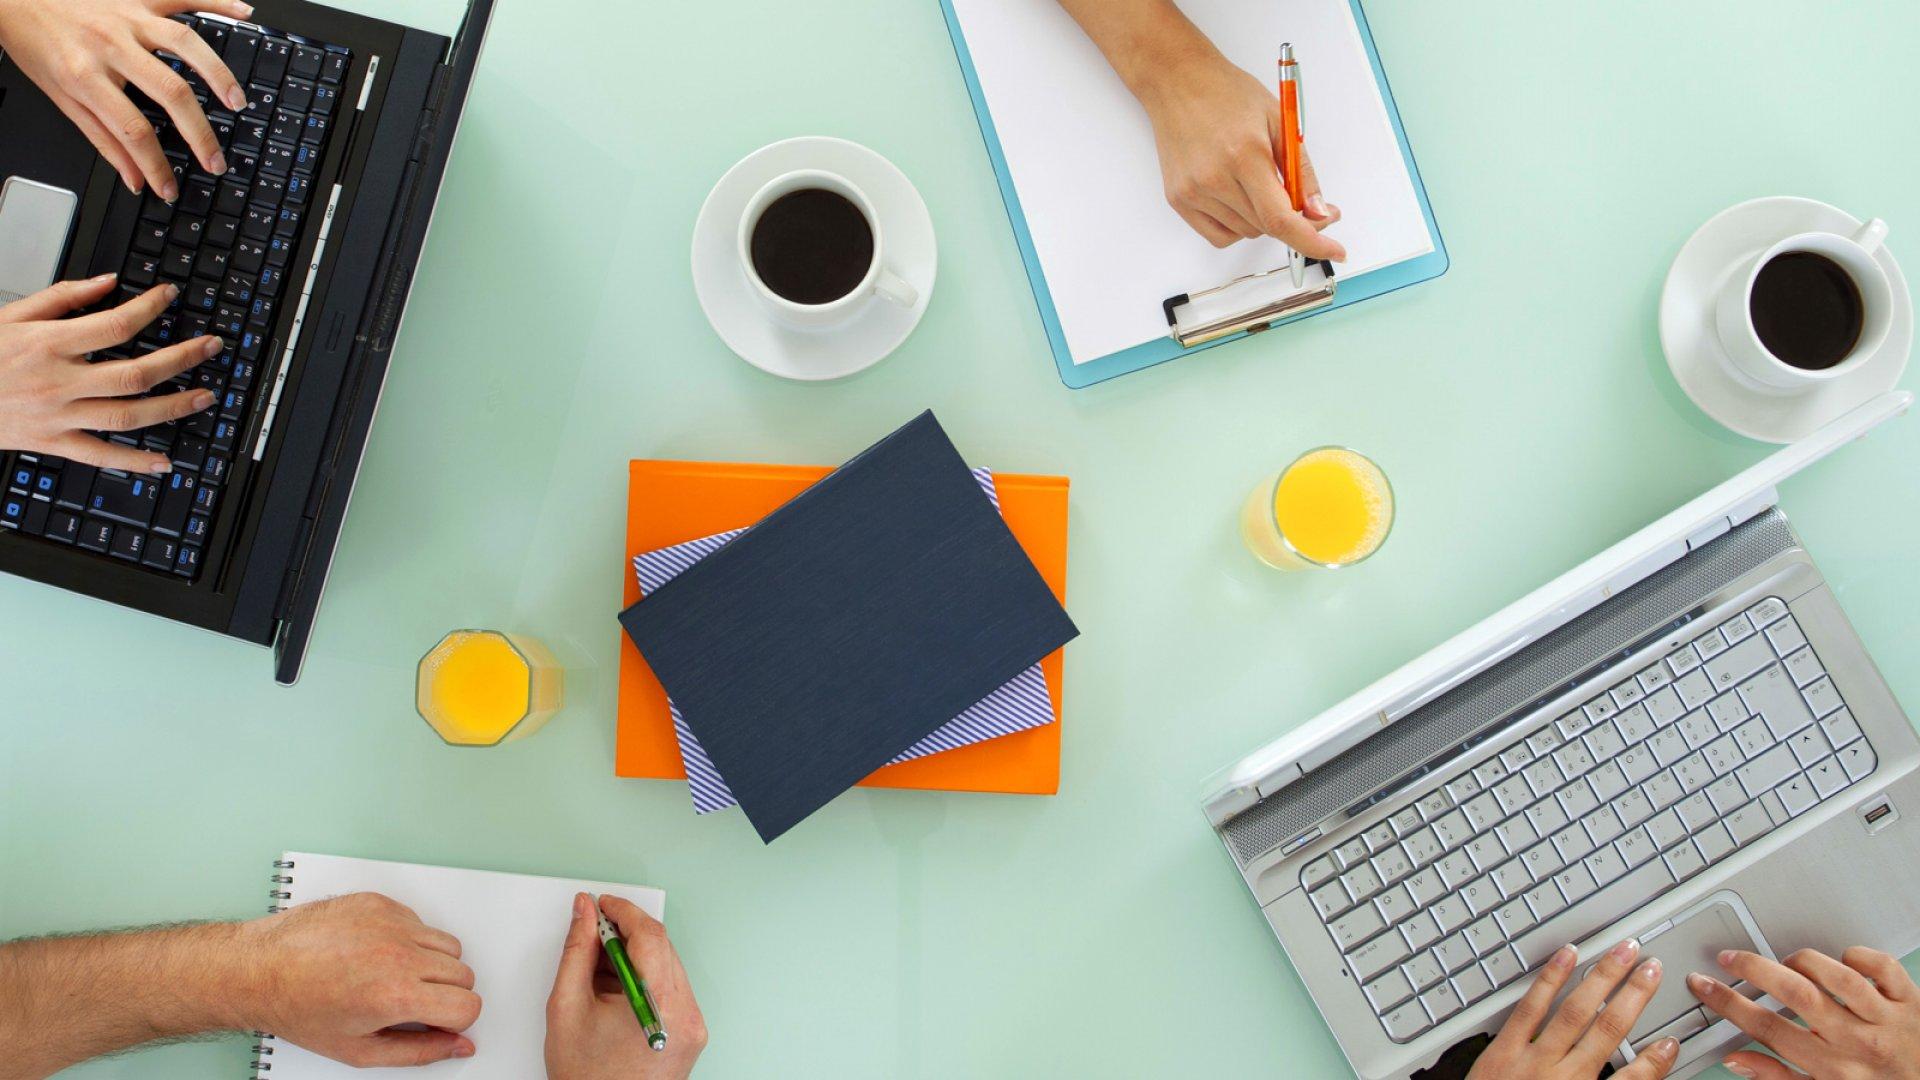 7 Steps to Turn a Ho-hum Meeting Into a Success